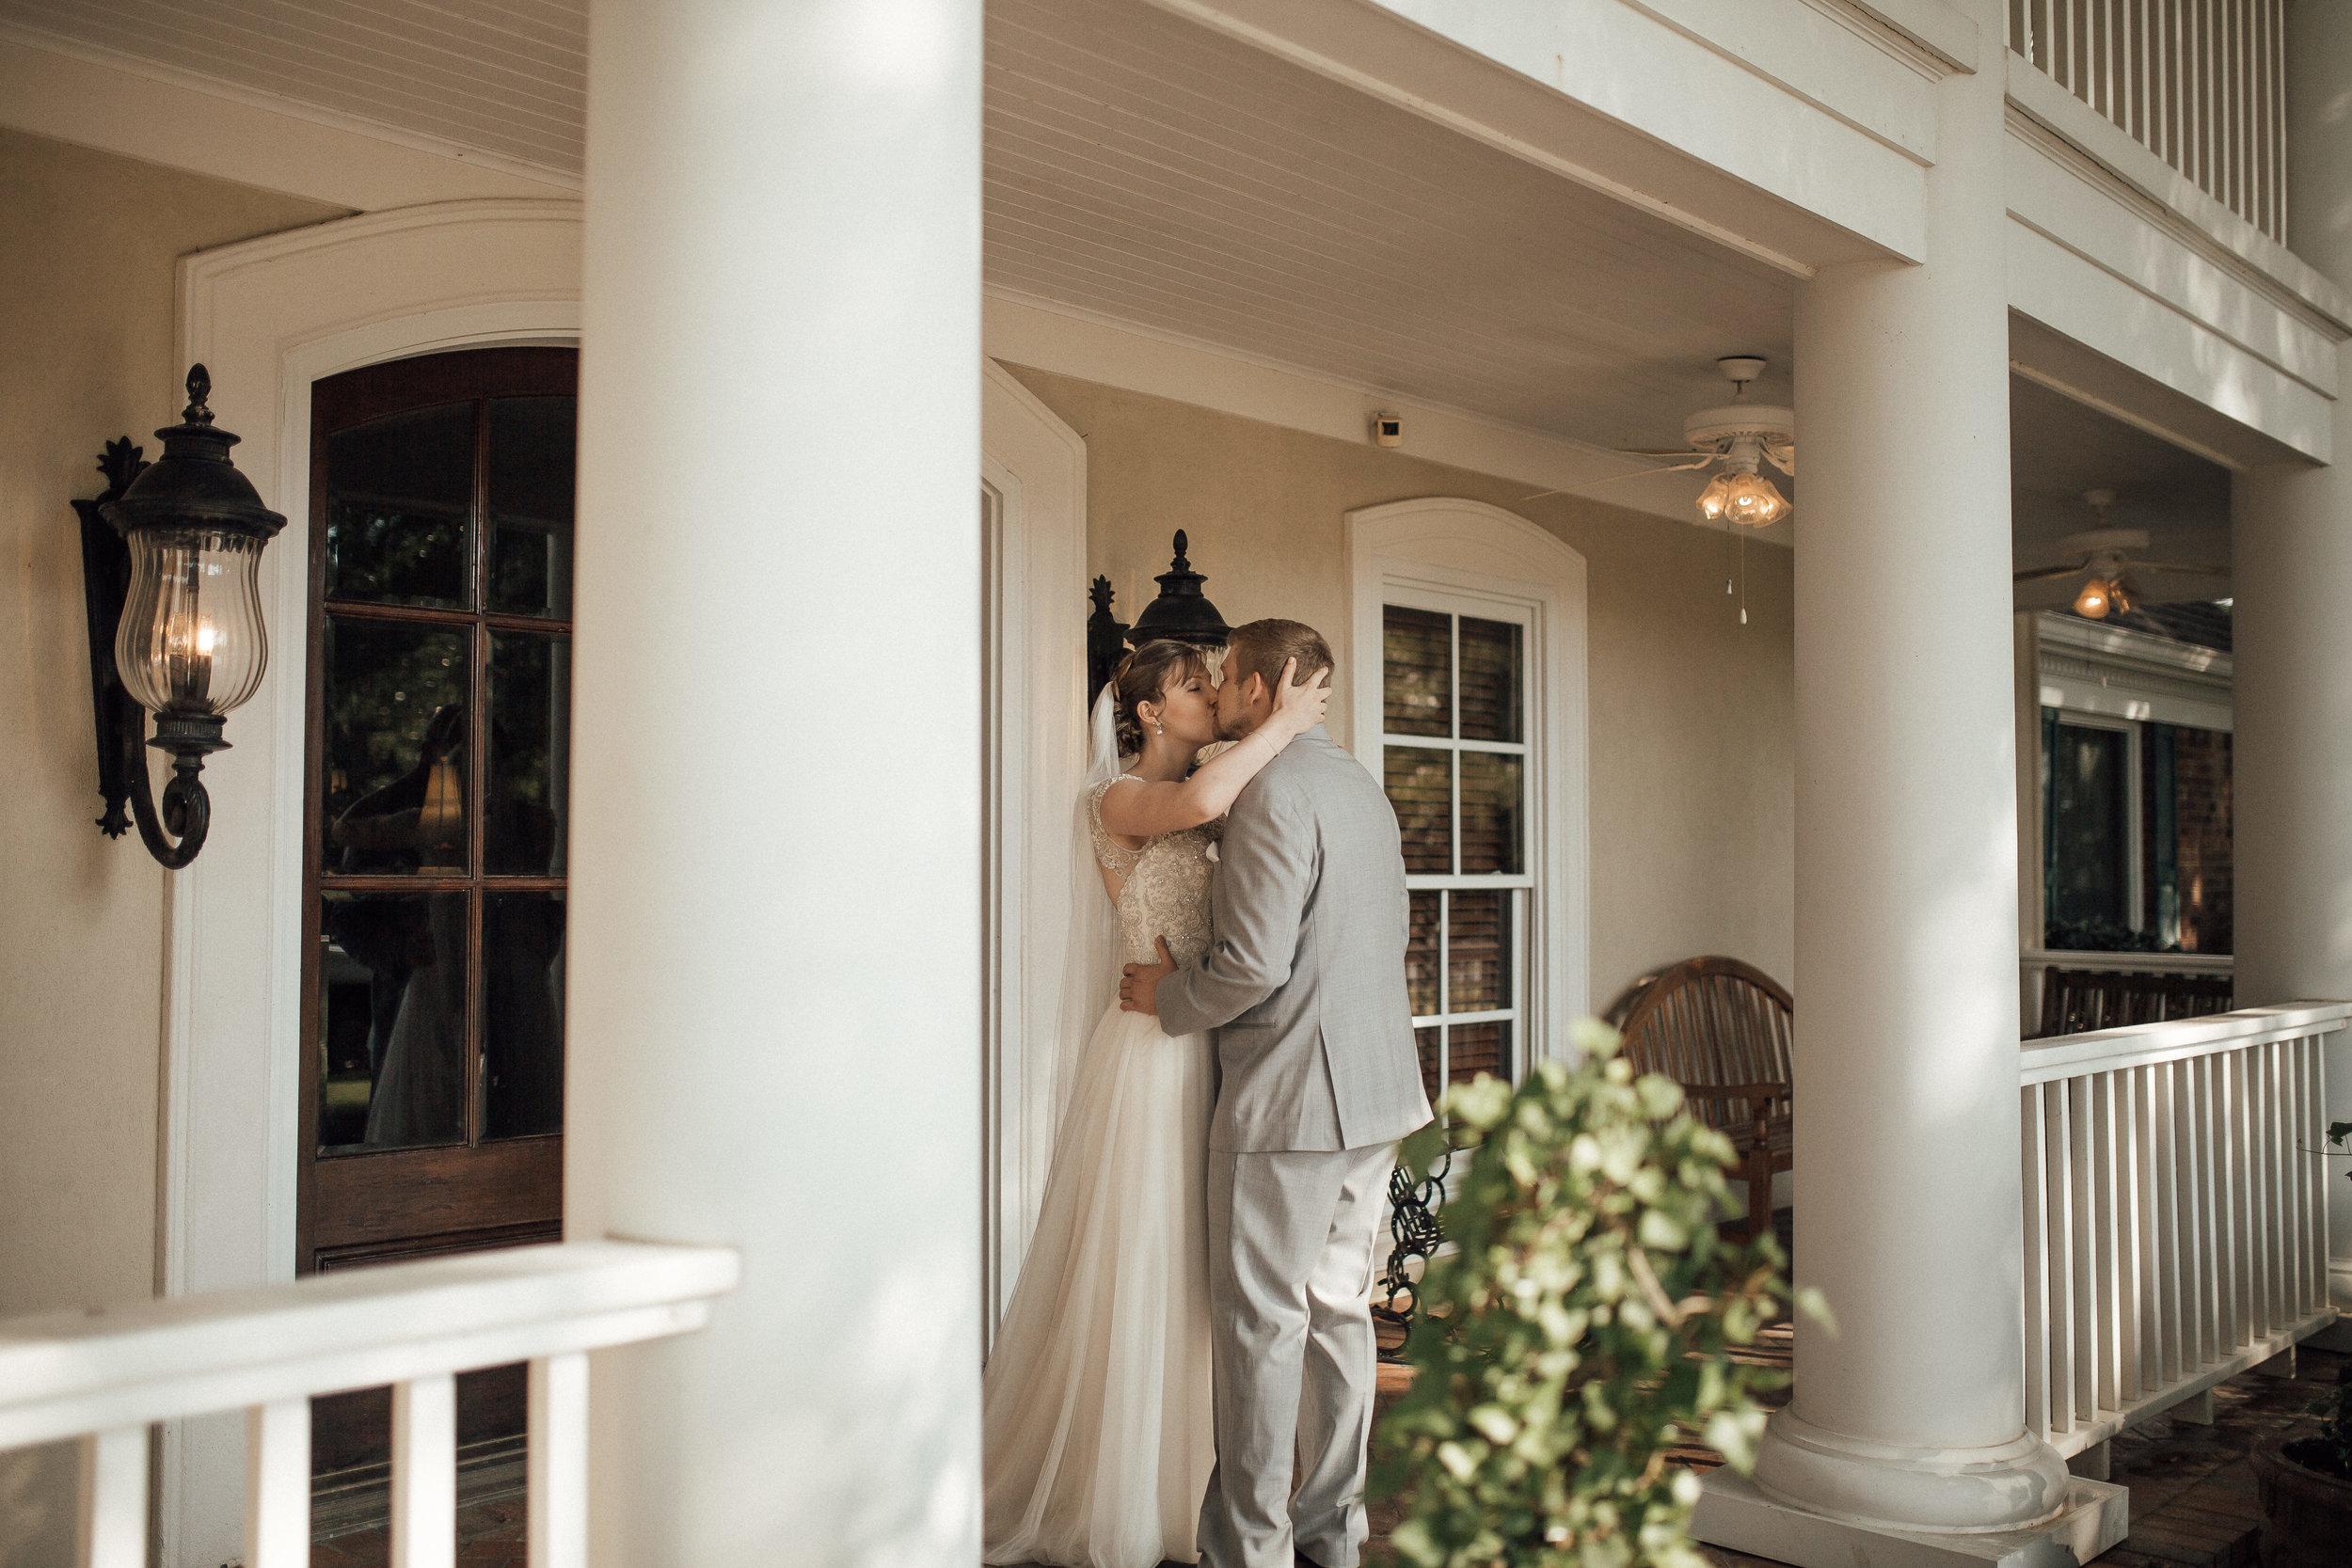 bride-groom-first-look-cassie-cook-photography-memphis-wedding-photographer